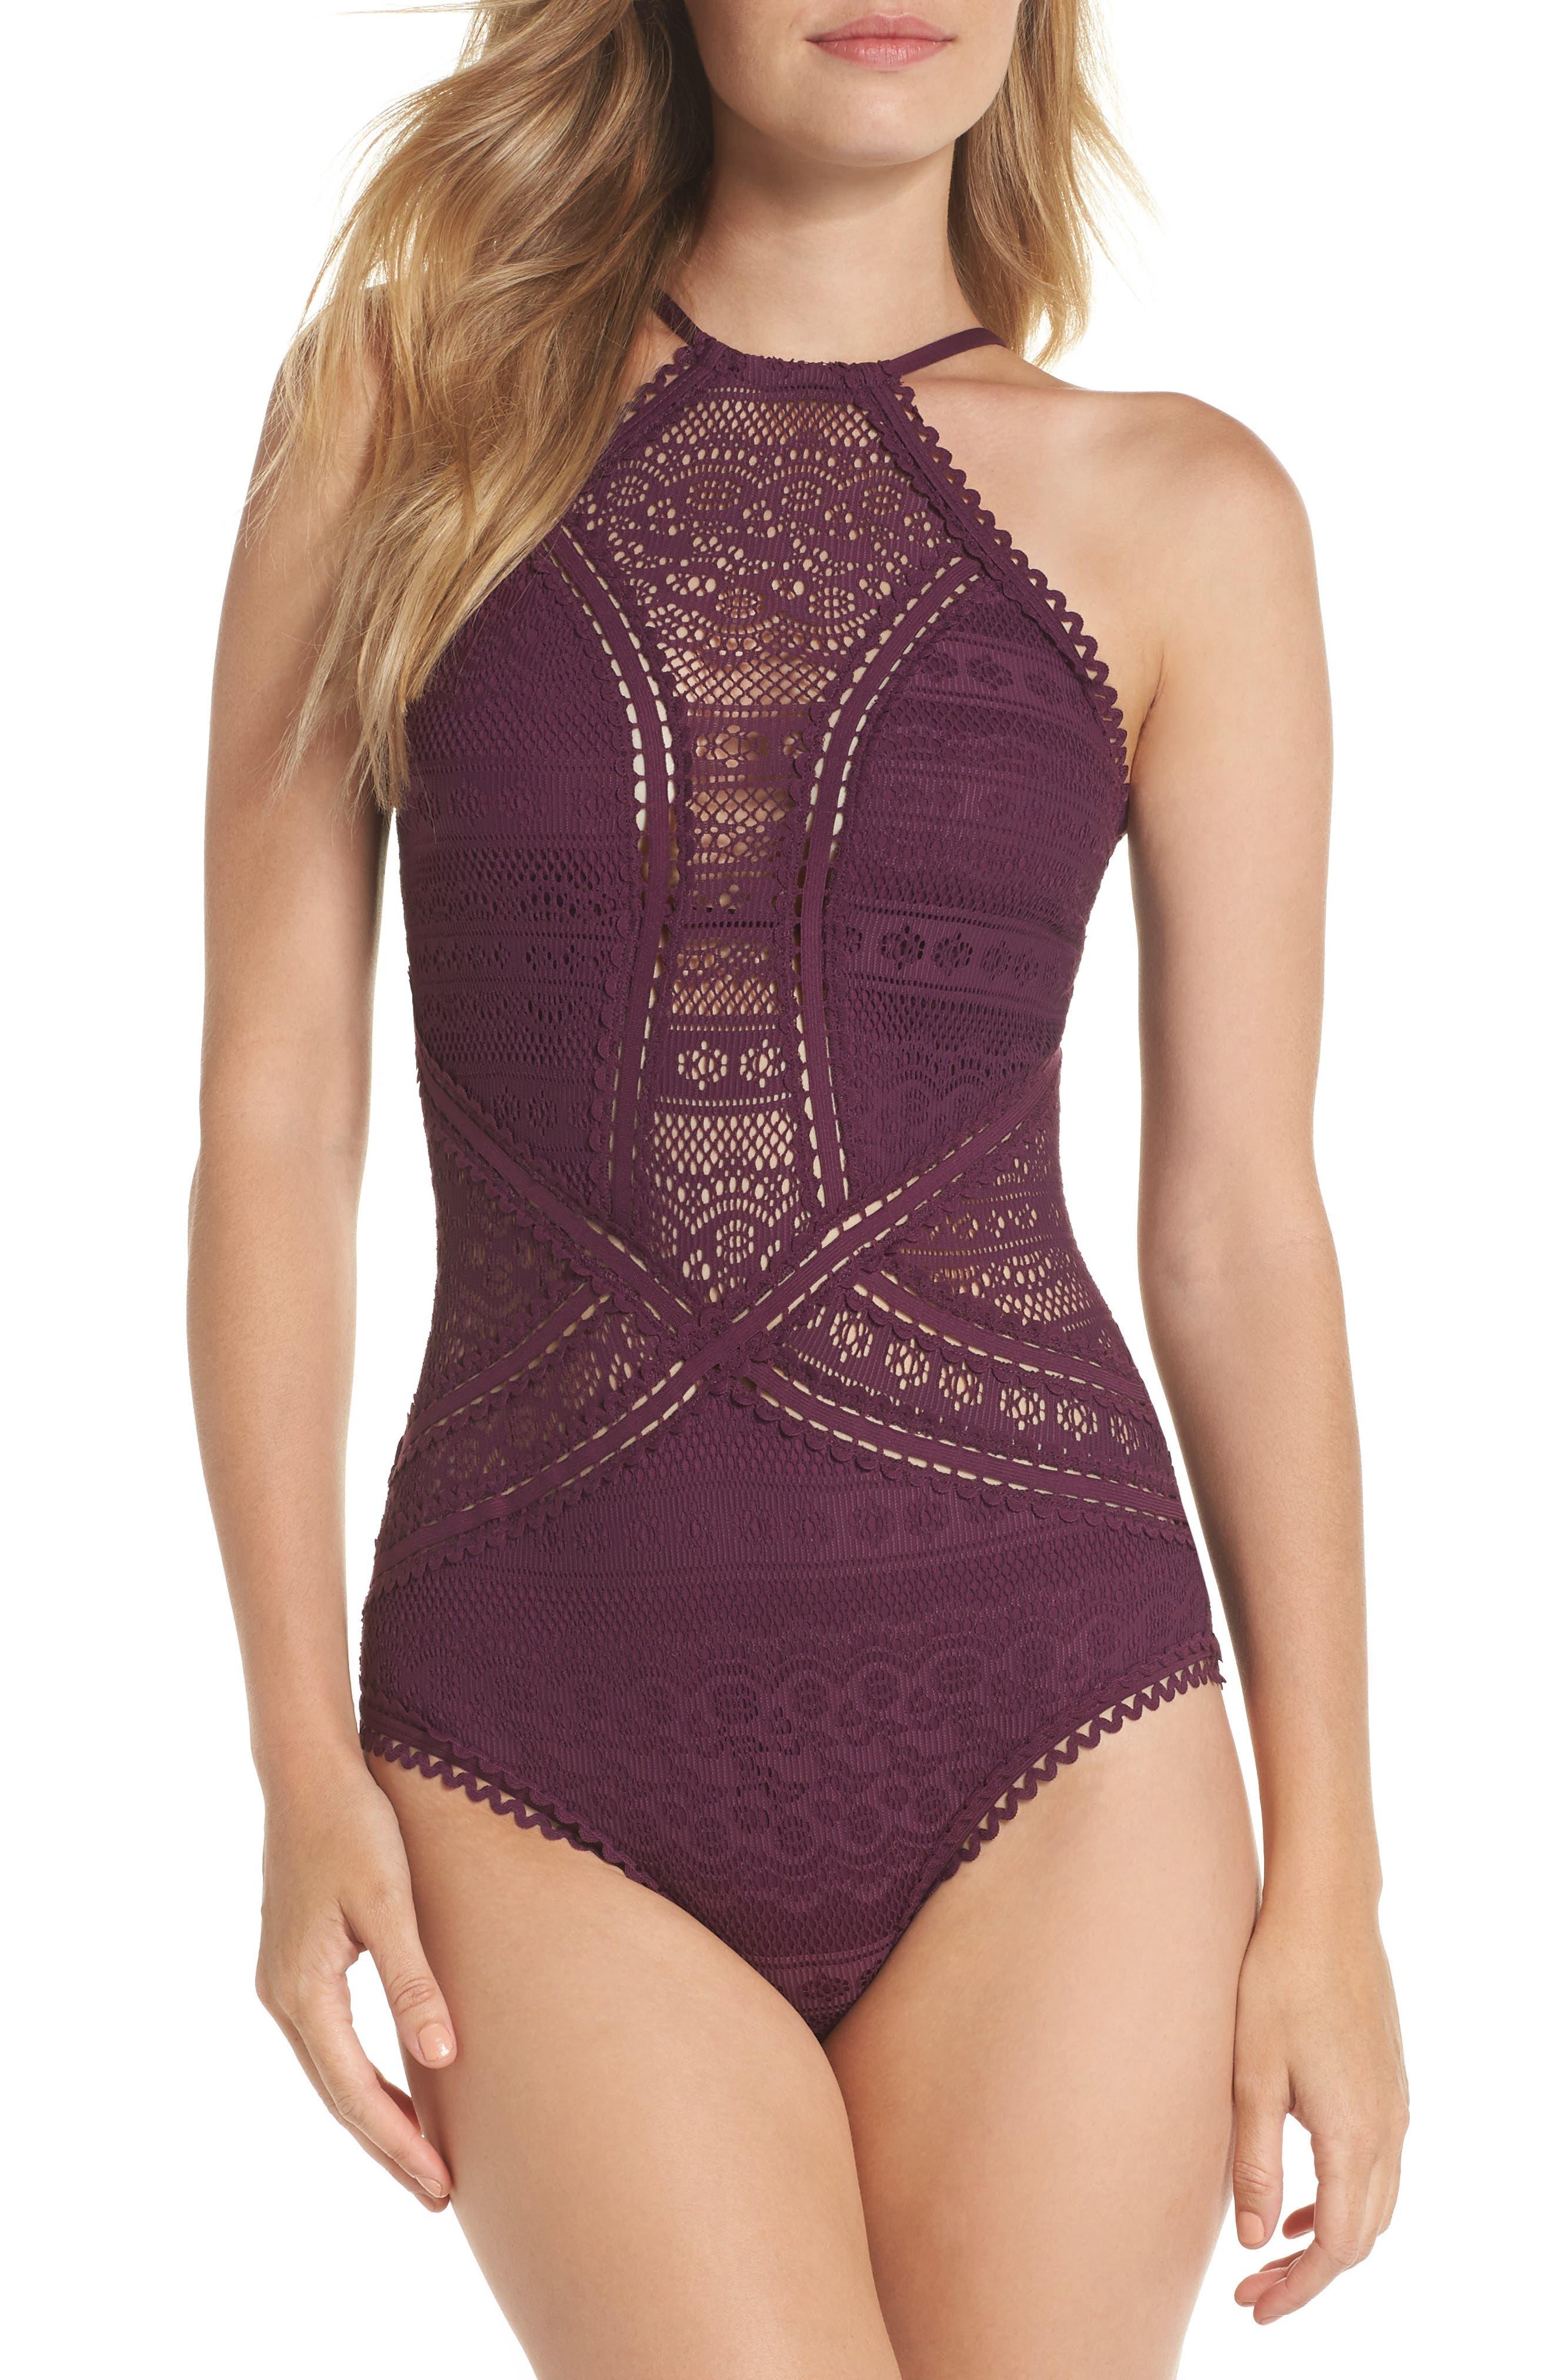 Becca Prairie Rose Crochet One-Piece Swimsuit, Burgundy